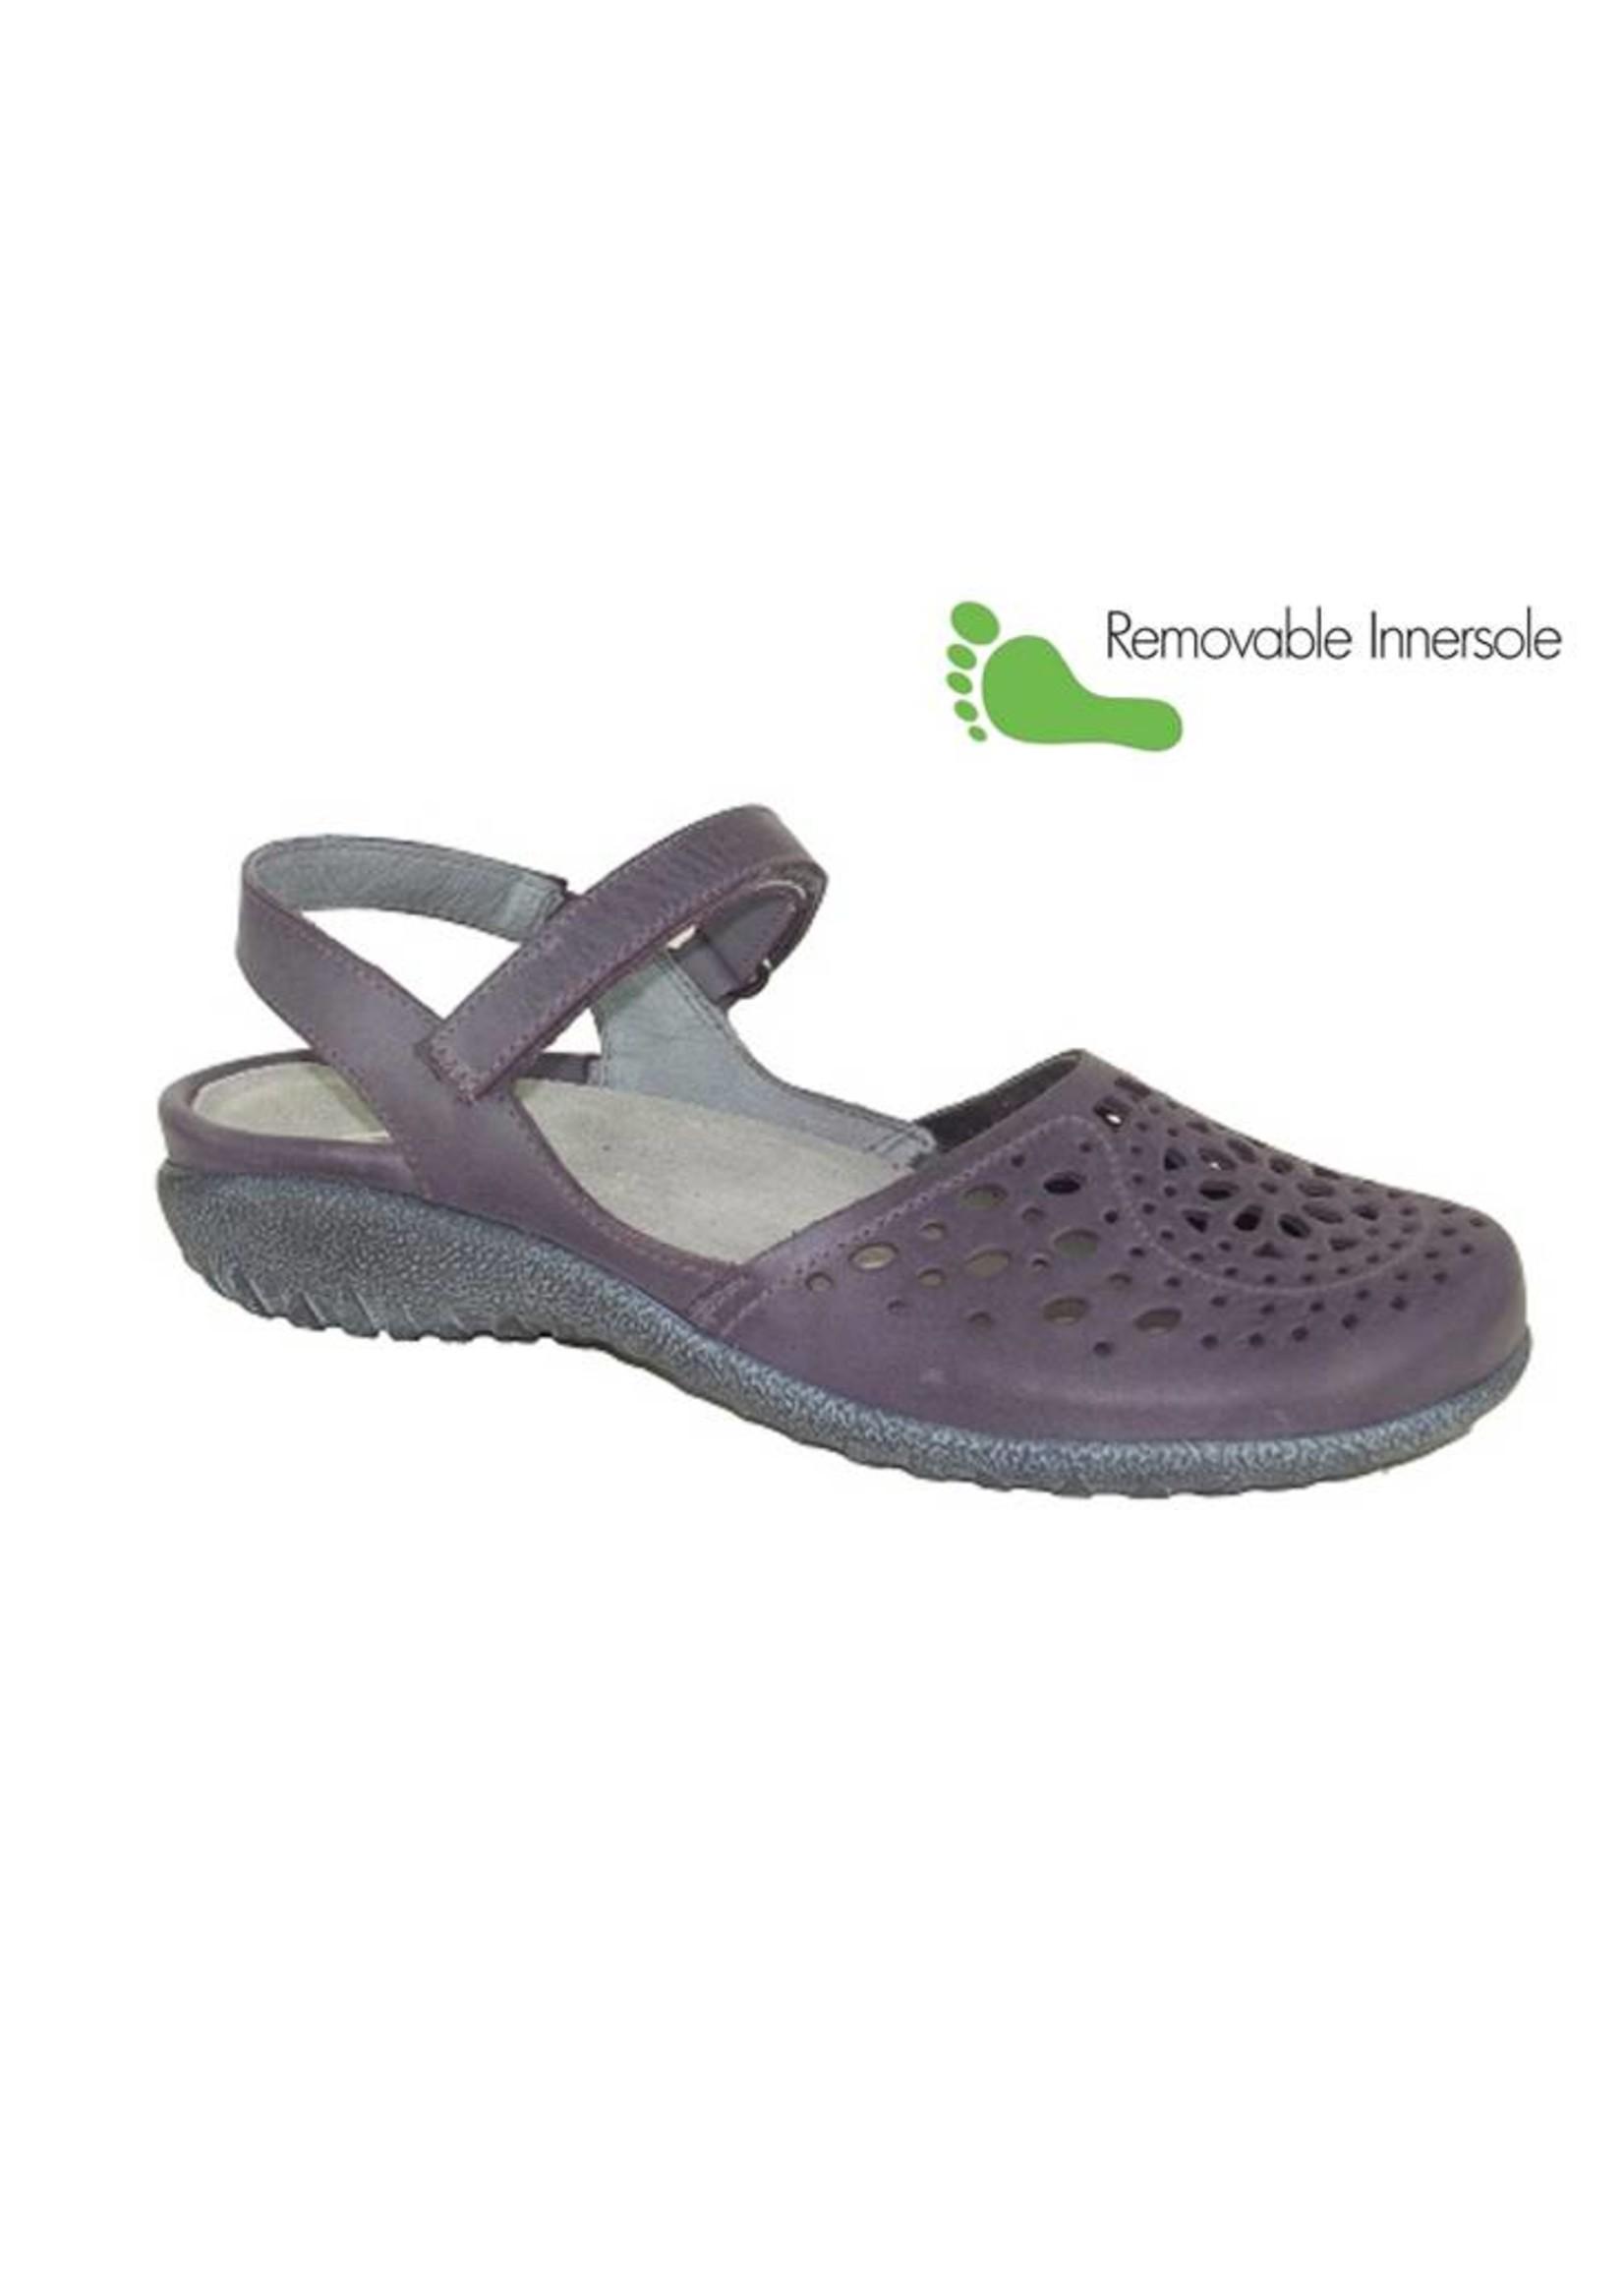 Naot Footwear Arataki in Brushed Purple